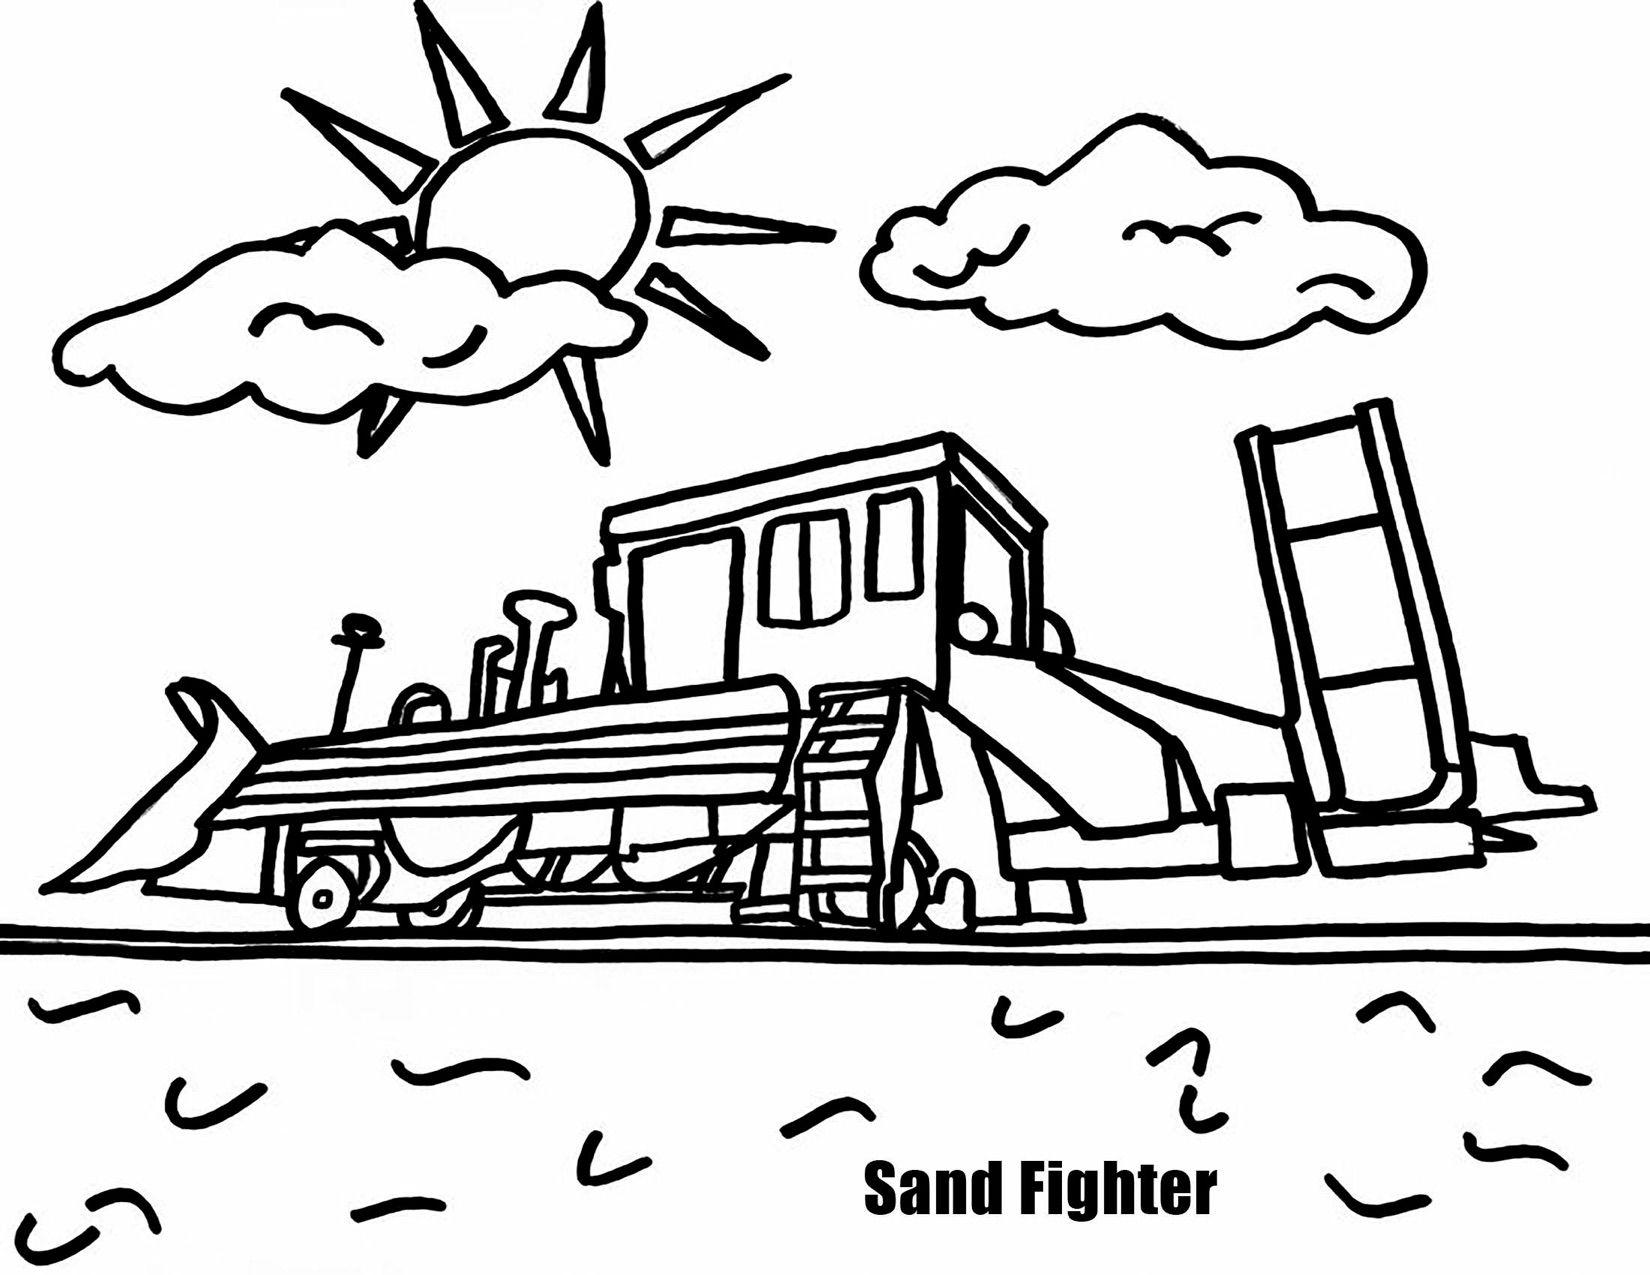 SAND FIGHTER